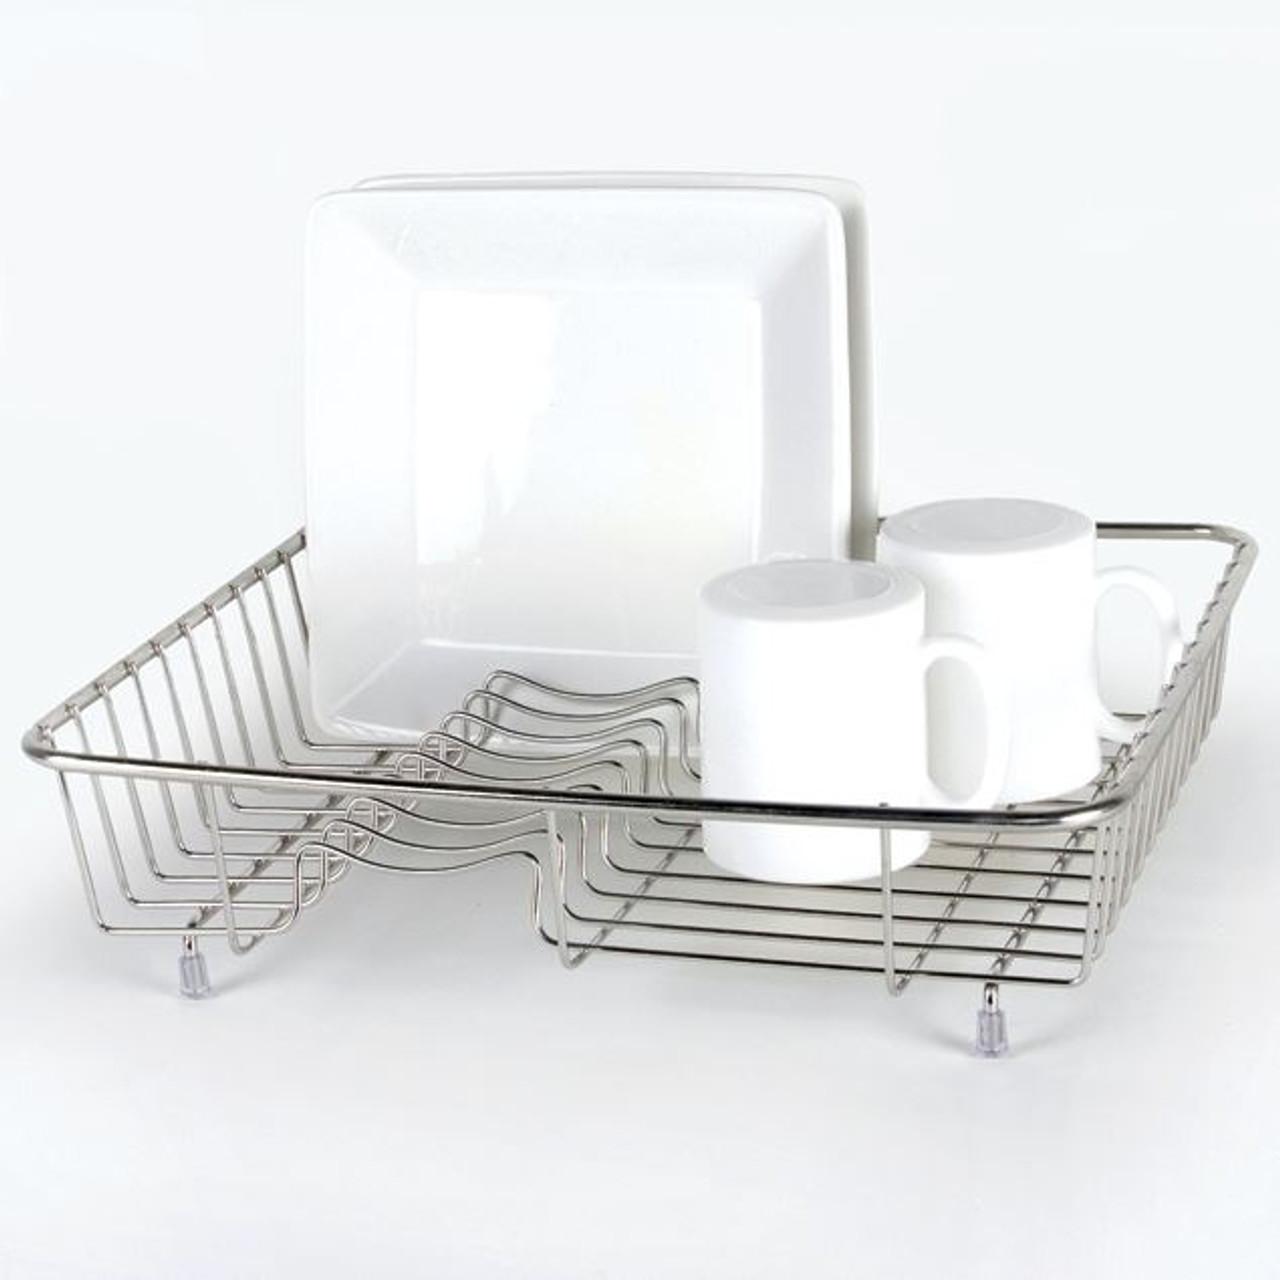 Delfinware Popular Dish Drainer Stainless Steel